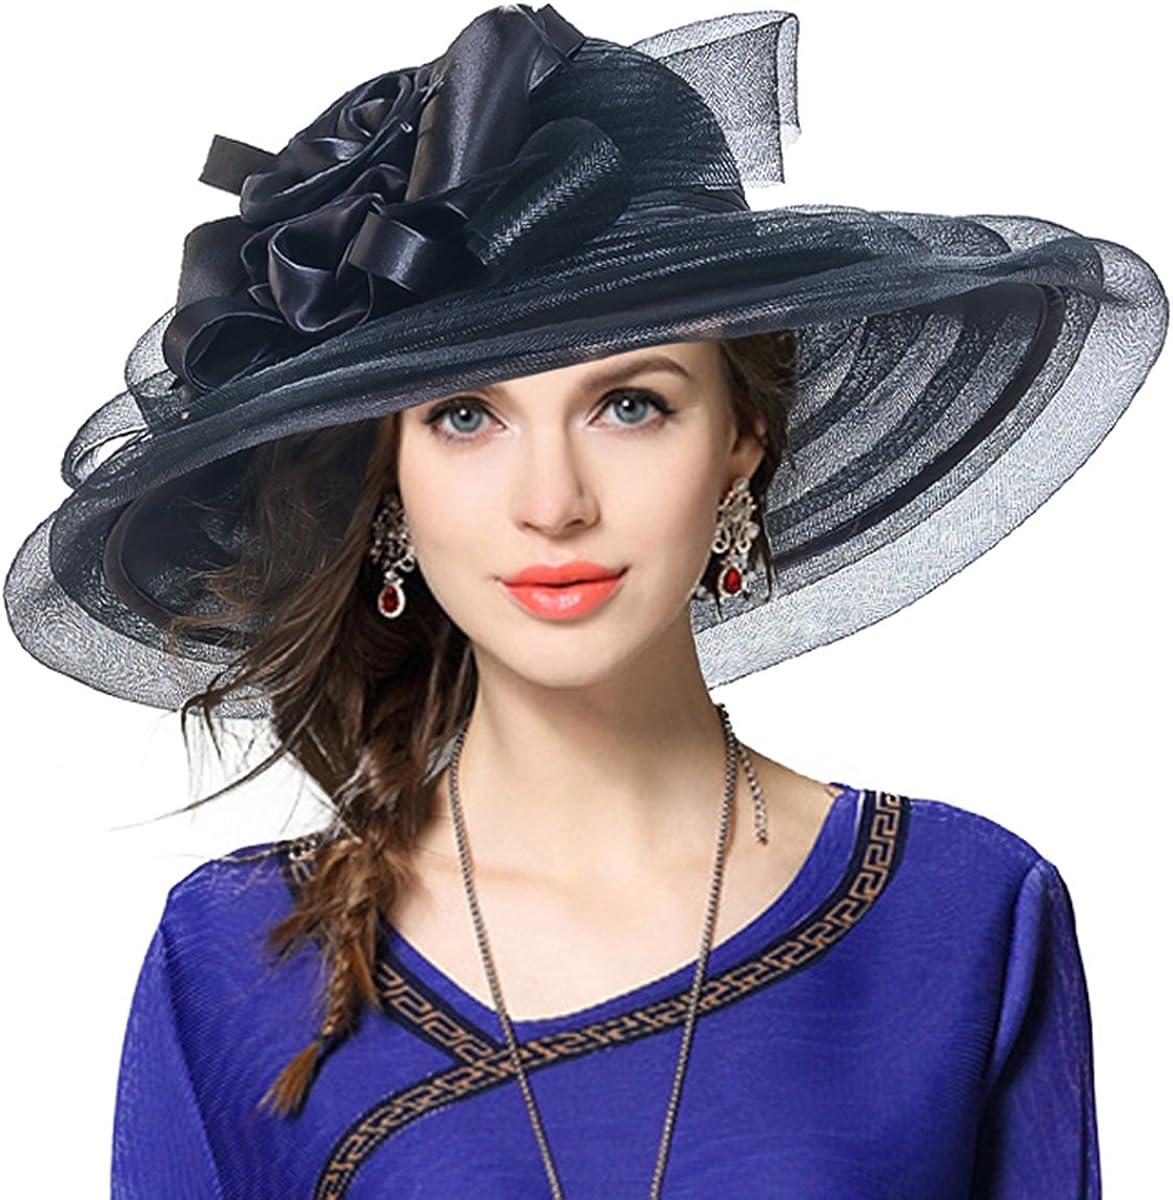 JESSE /· RENA Women Organza Church Derby Wedding Dress Tea Party Racing Hat CS019